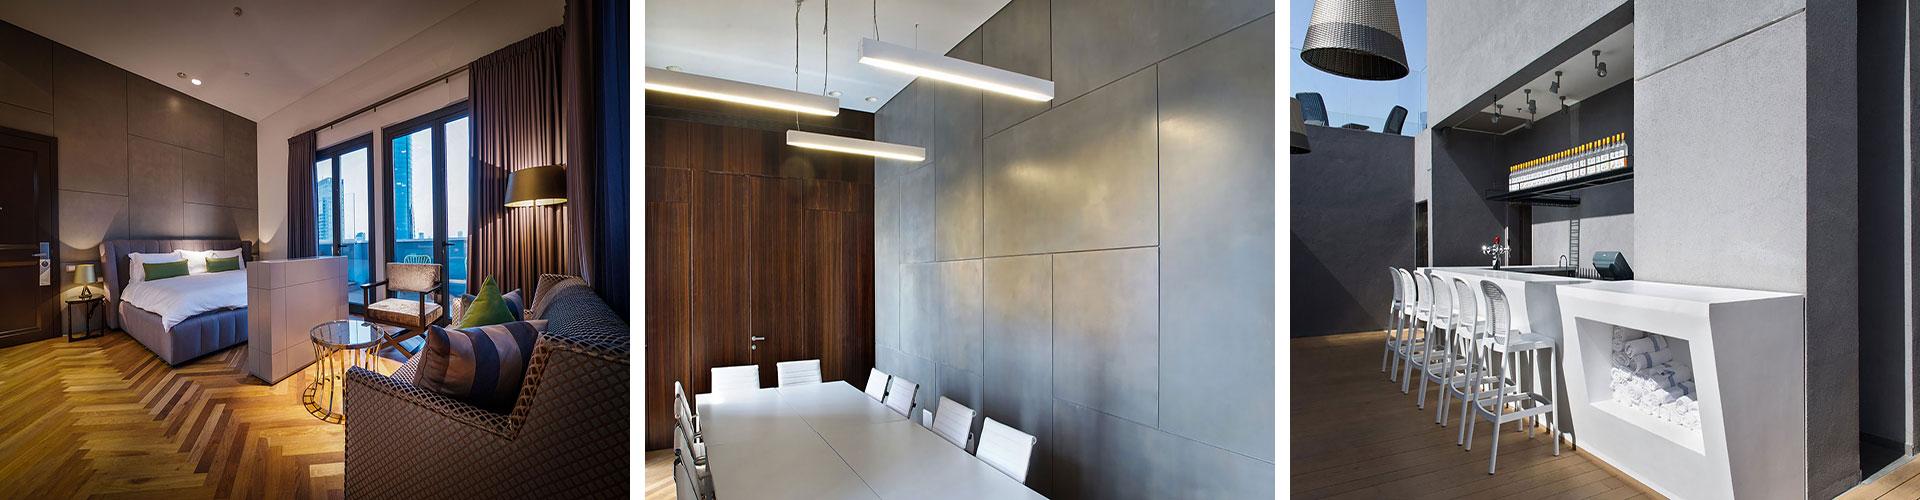 microtopping-concrete-design_-By-BETONADA